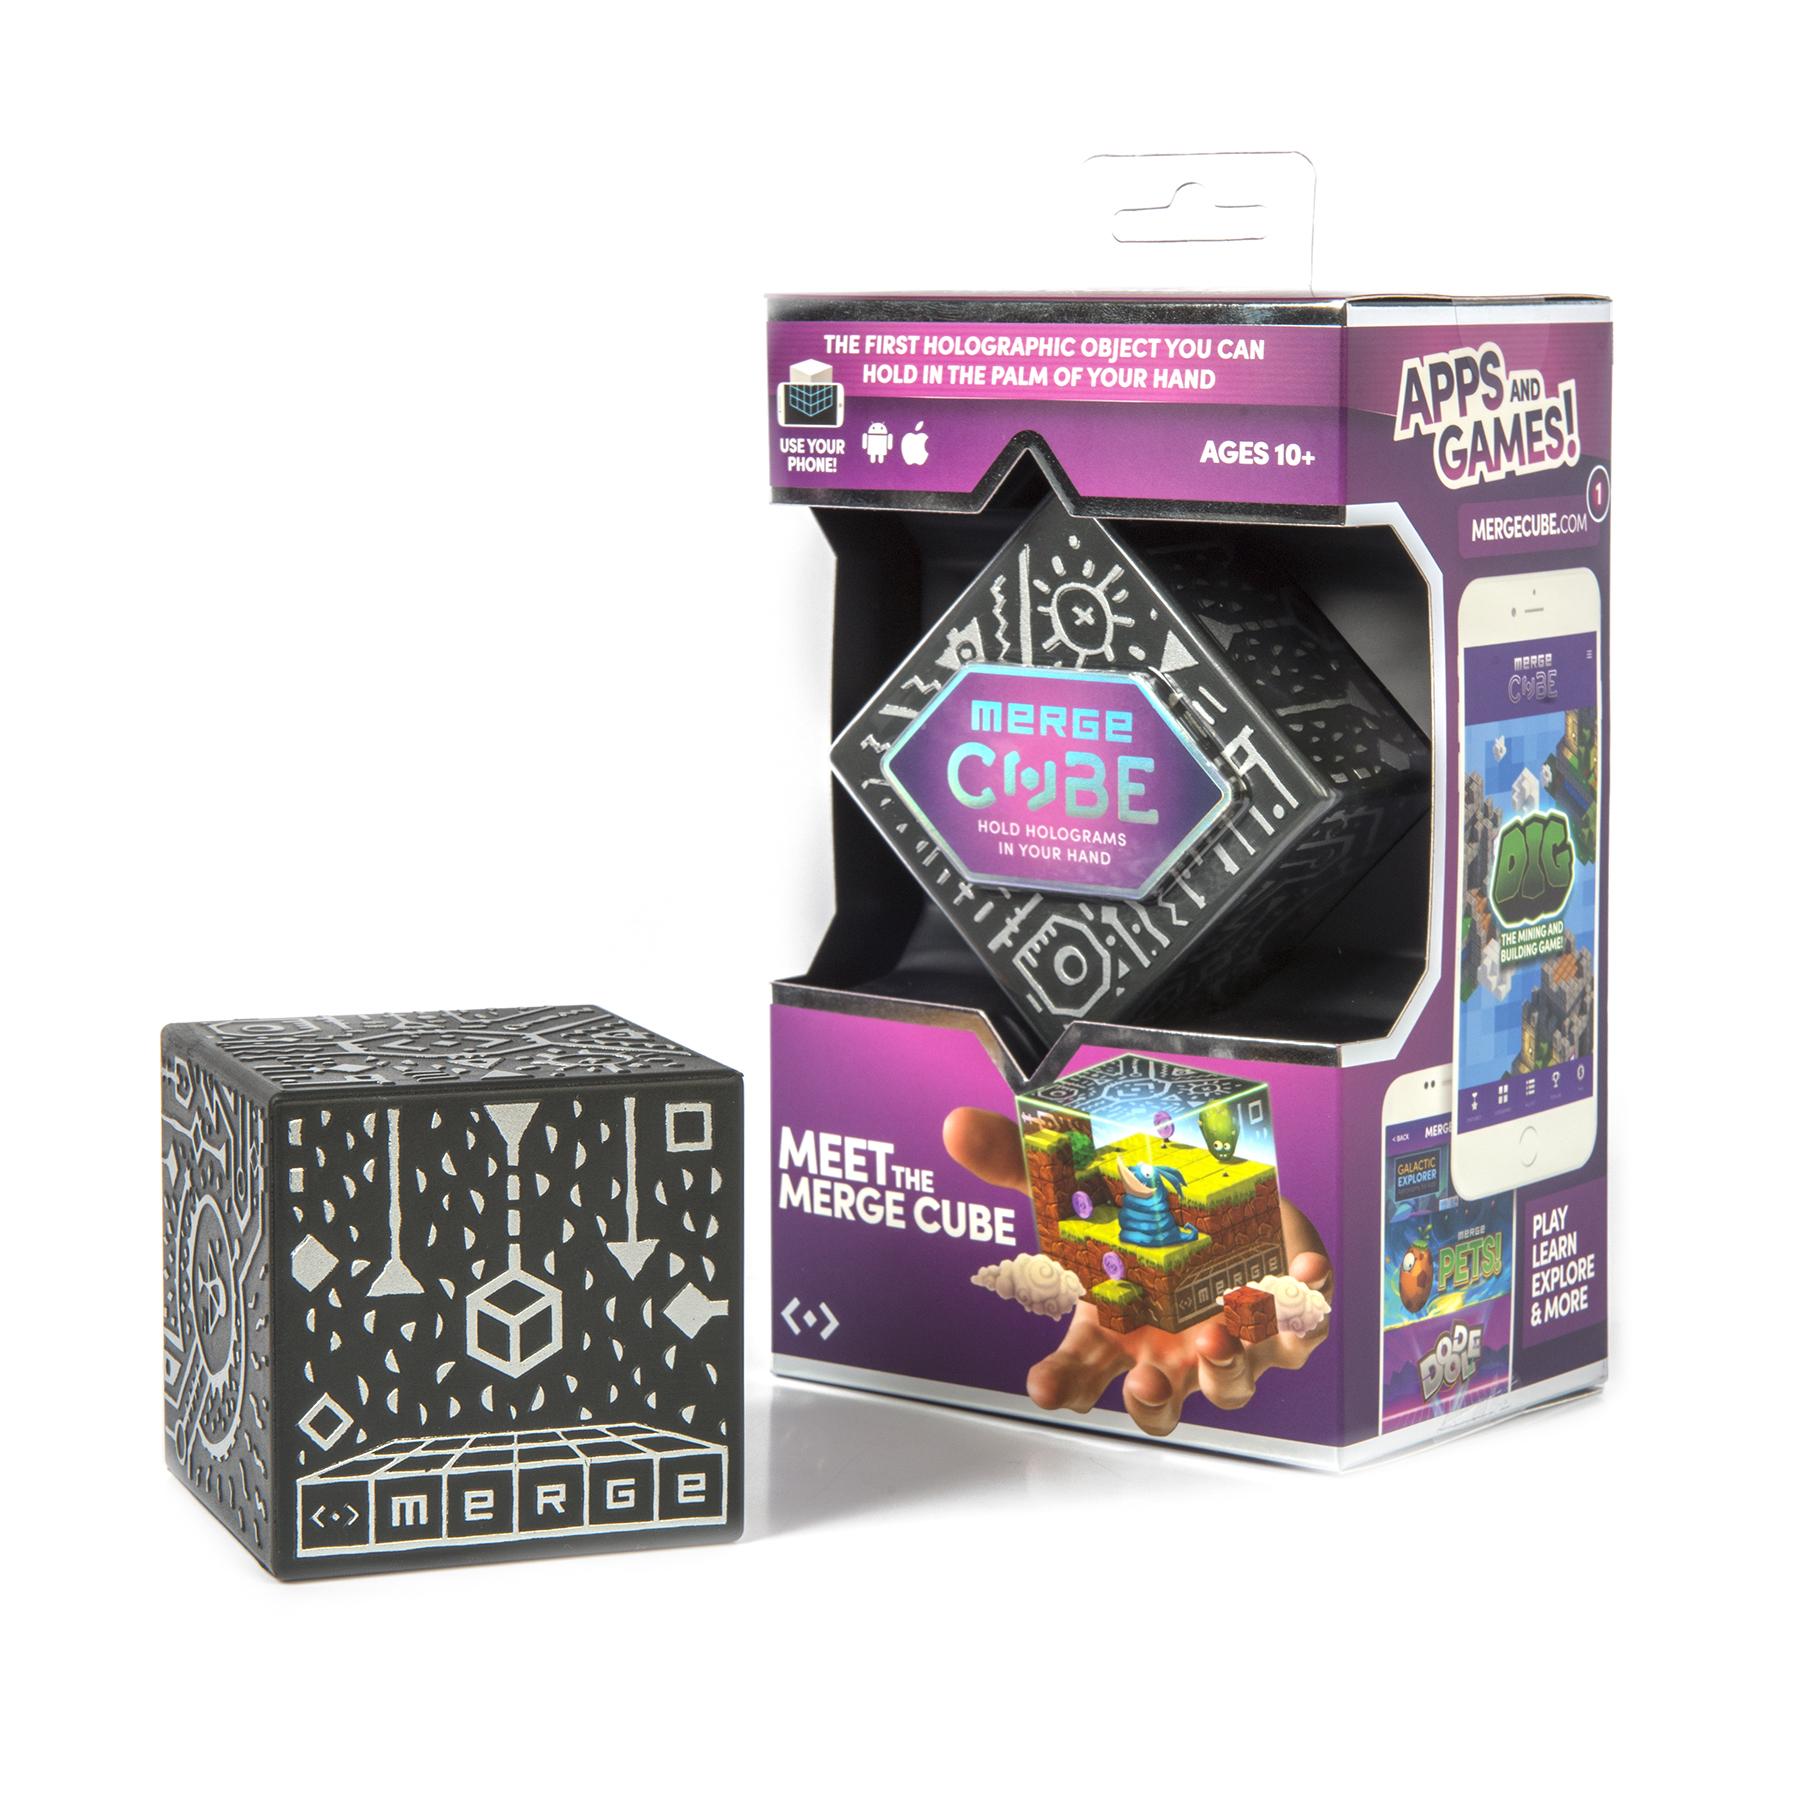 MergeVR Cube - Walmart clearance in-store YMMV $3